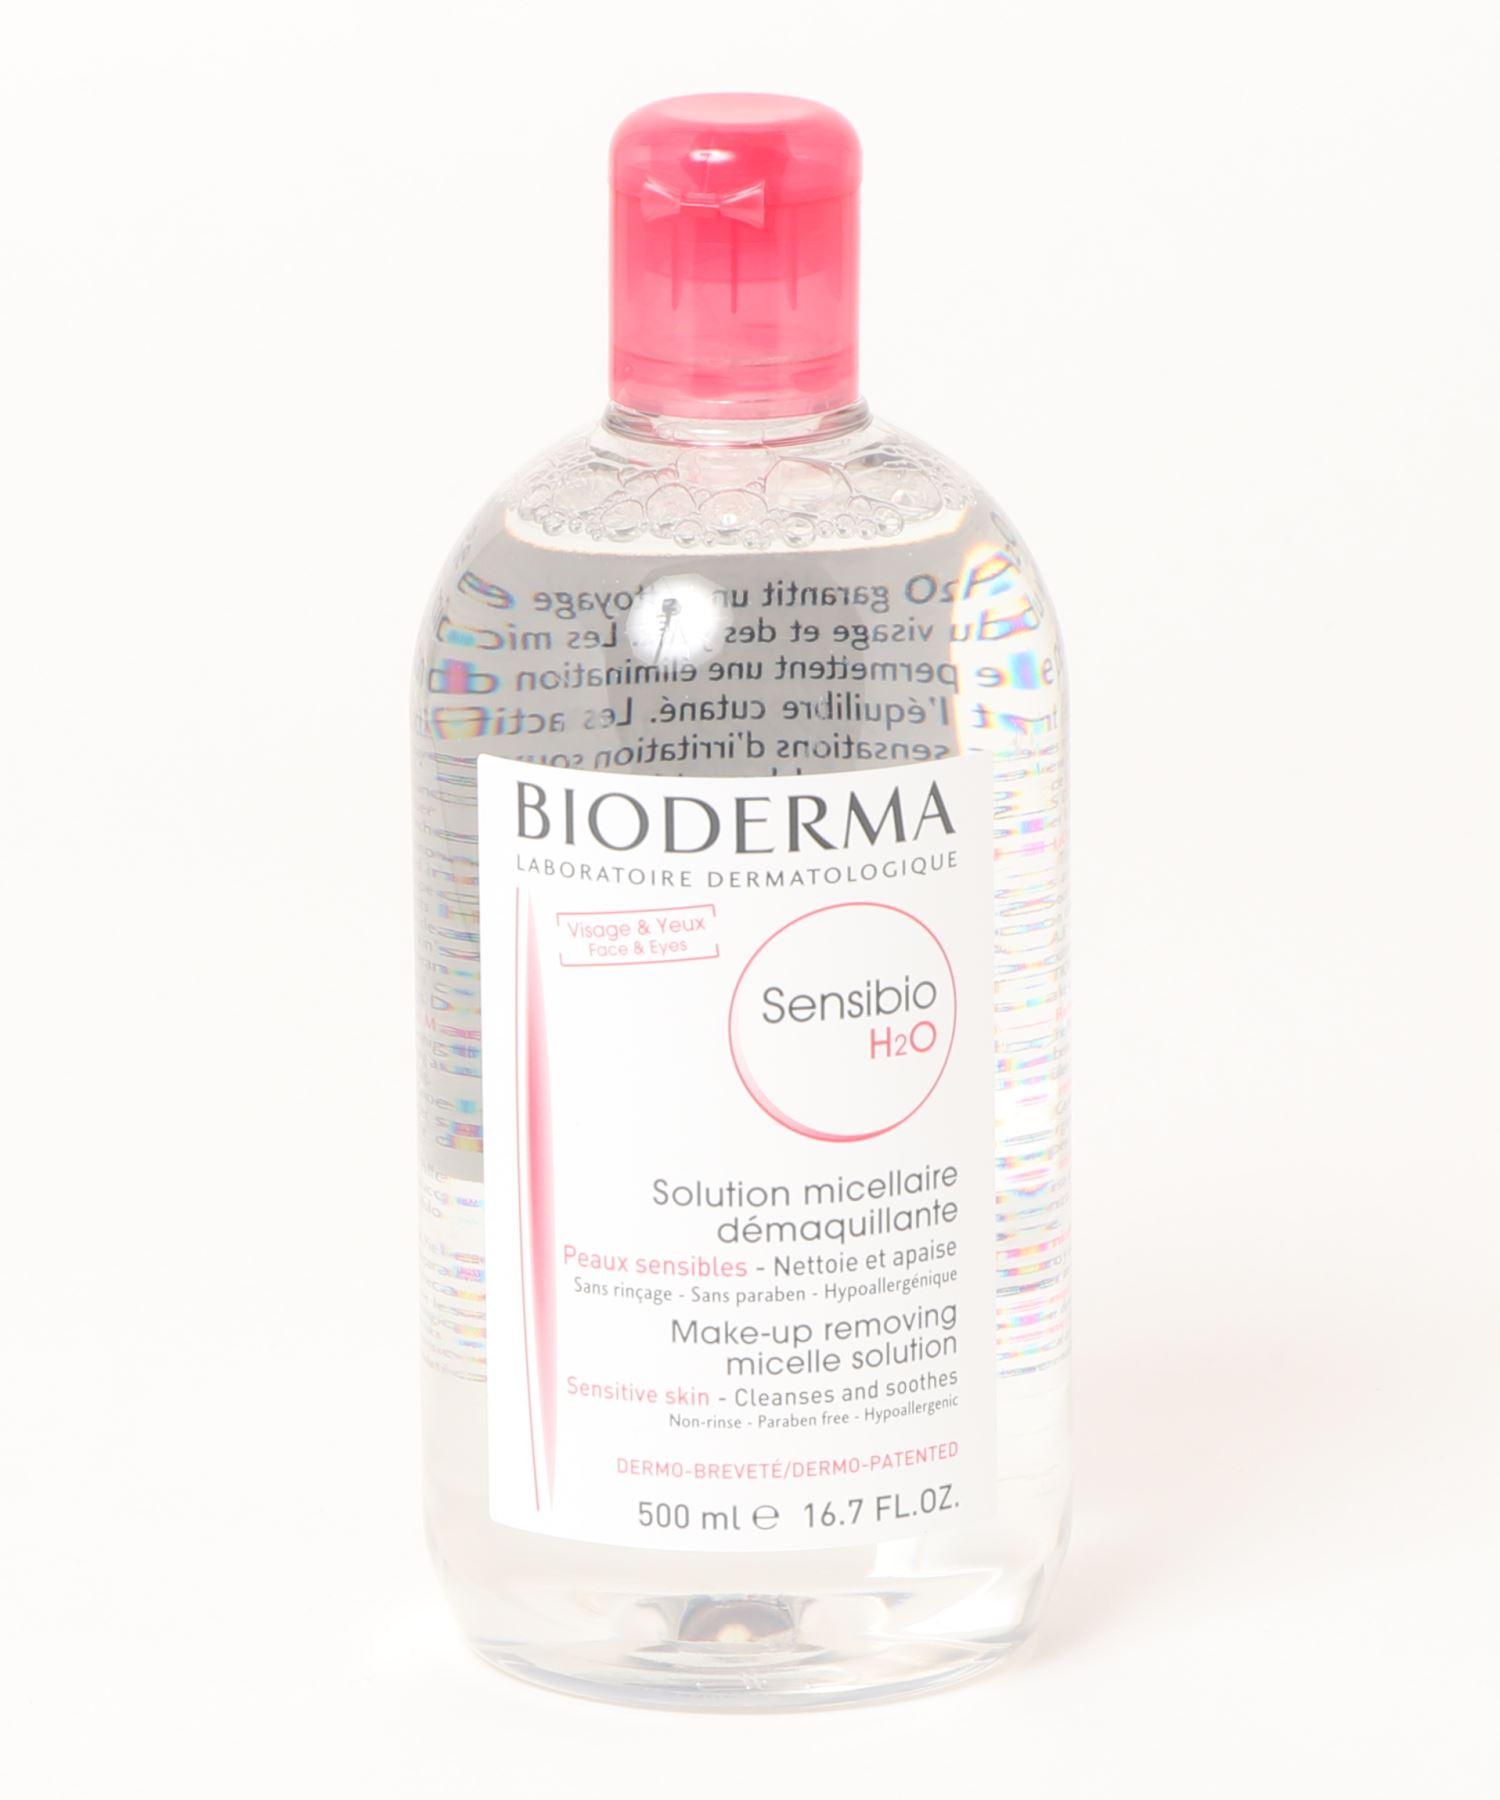 【 BIODERMA / ビデルマ 】サンシビオ H2O D 500ml RIY